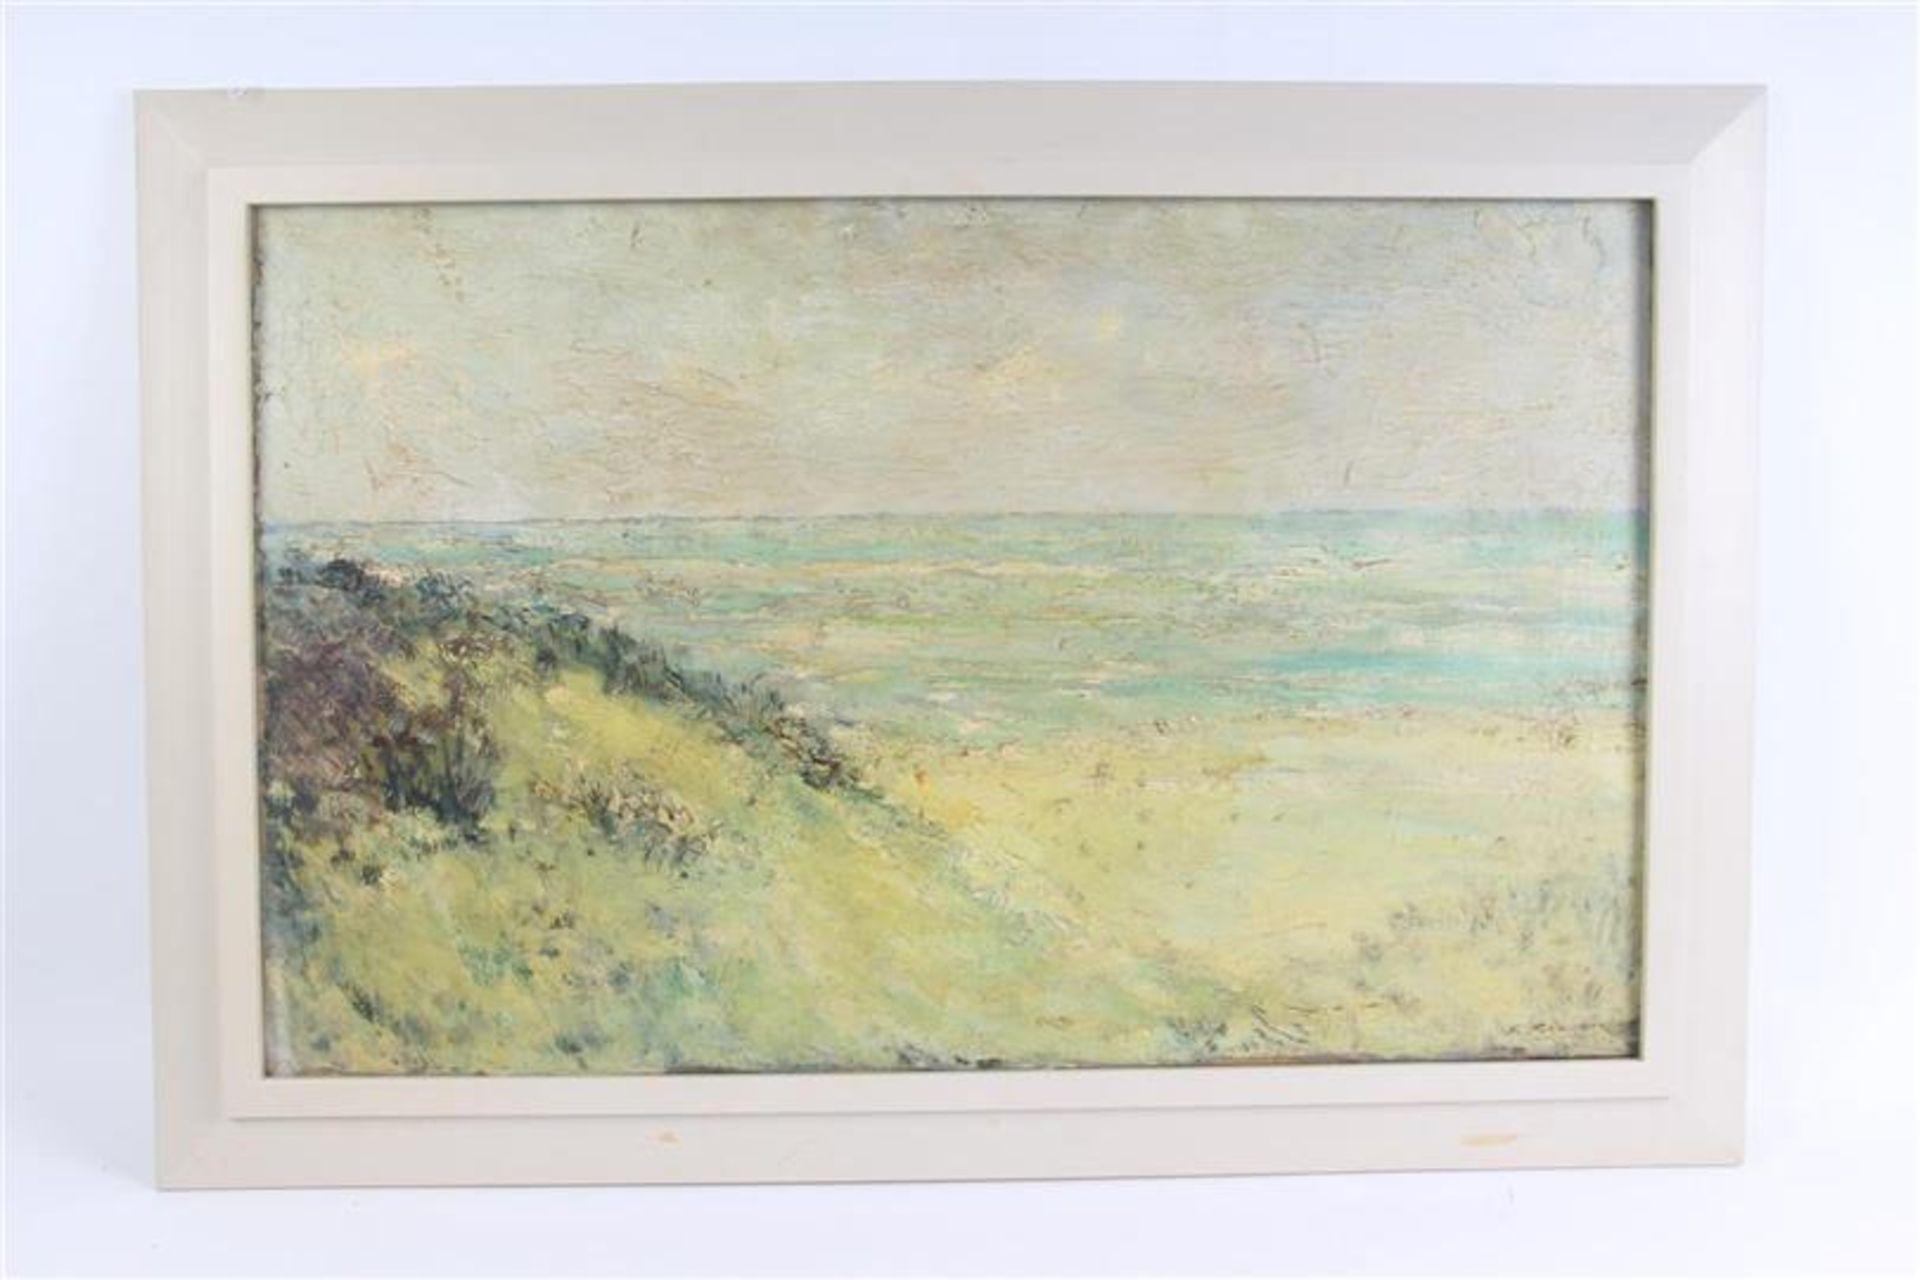 Schilderij, olieverf op doek 'Strandgezicht'. Simon Kramer (1880-1957) HxB: 49.3 x 79.3 cm.